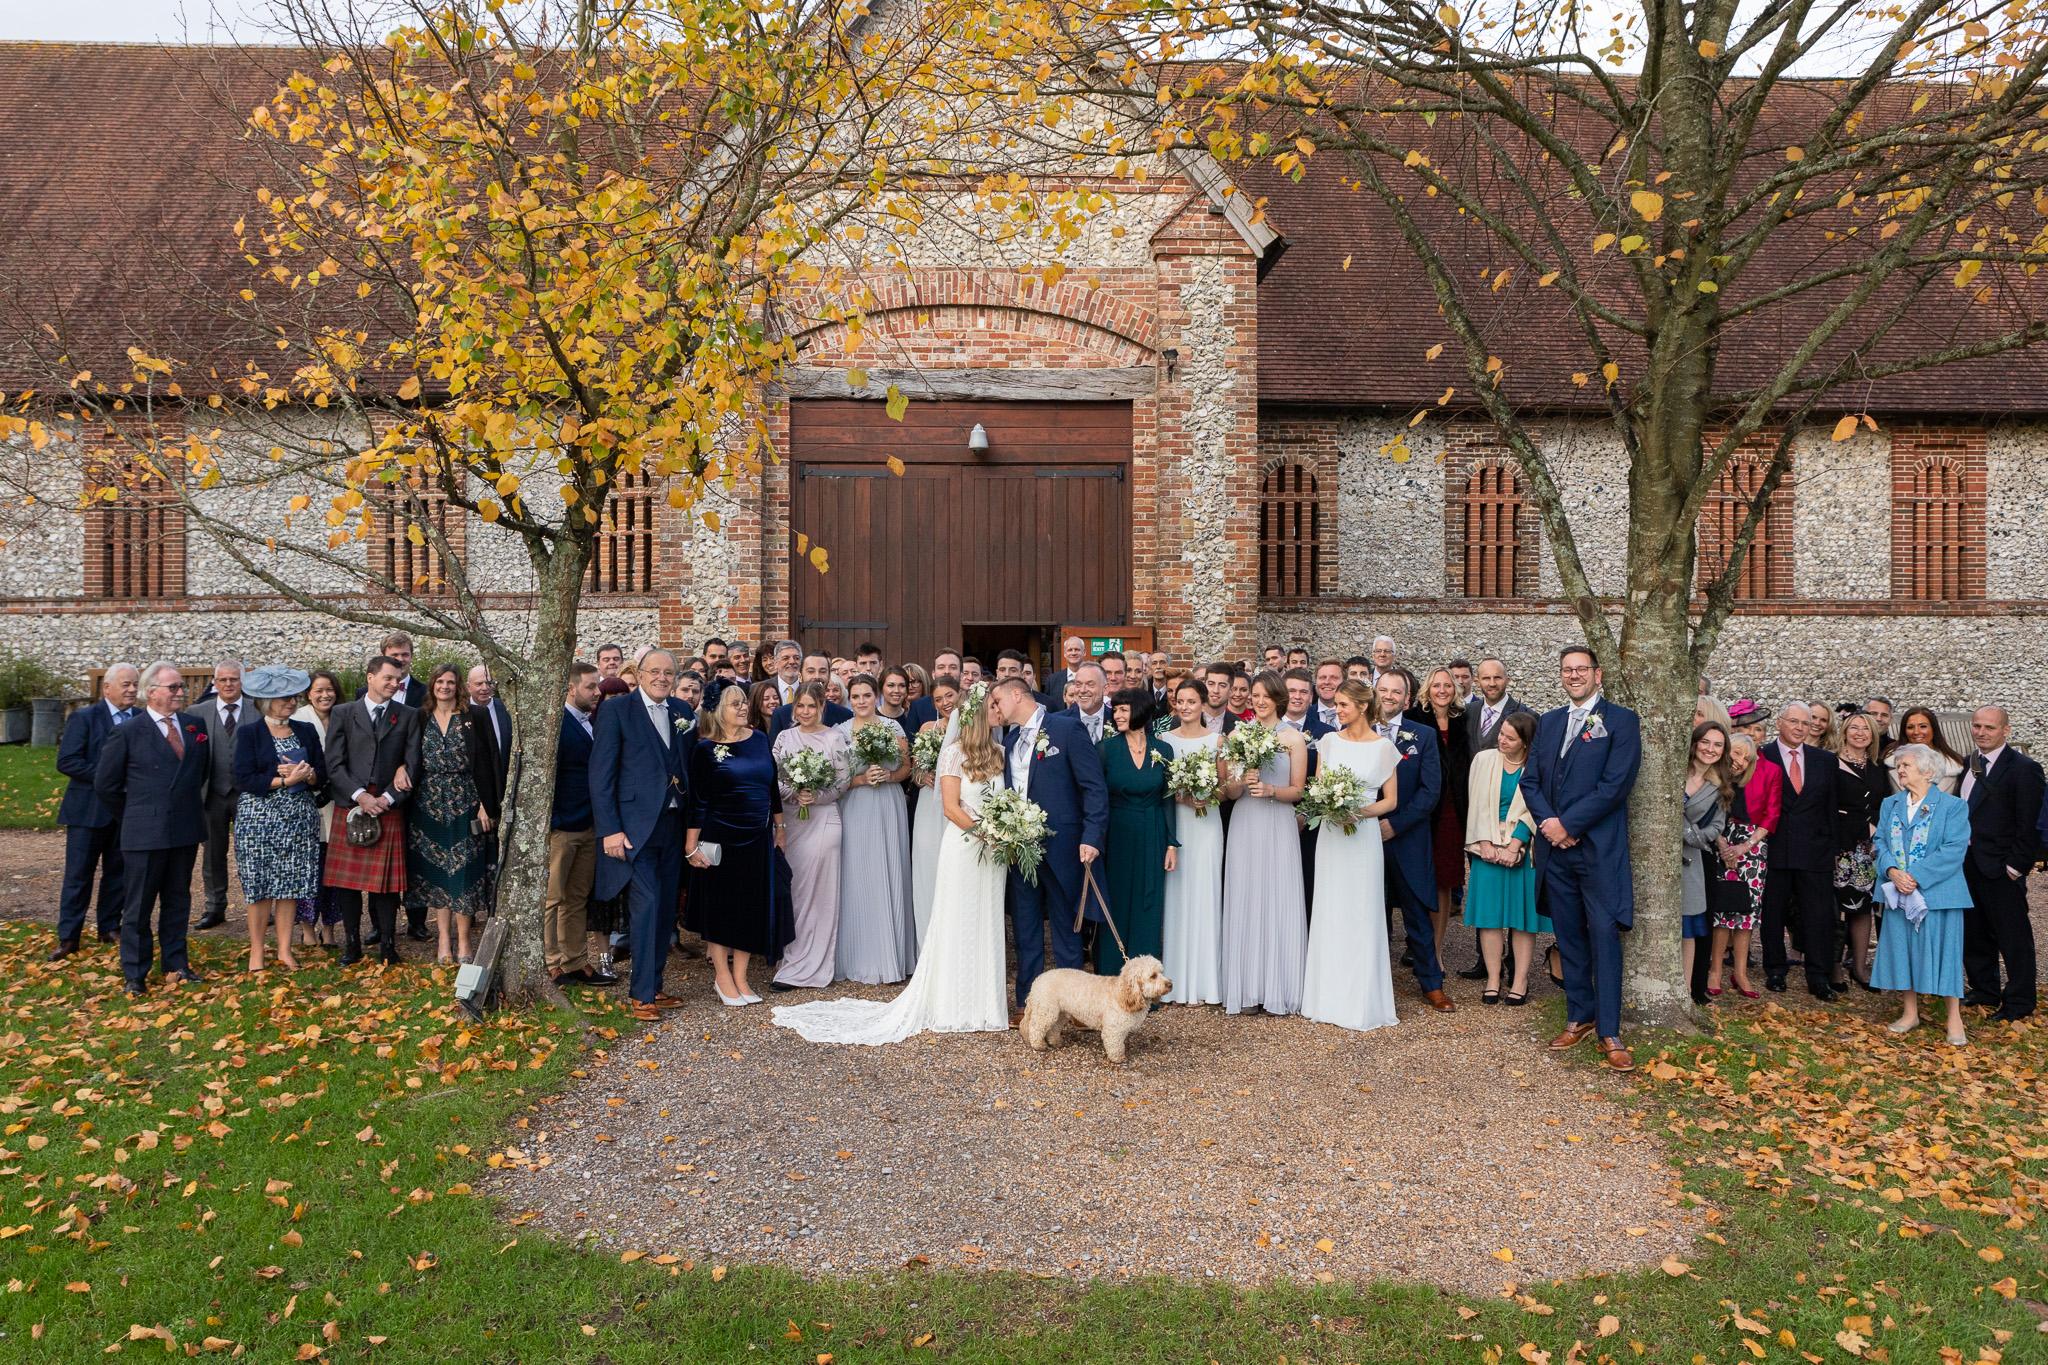 Tithe_Barn_Hampshire_natural_wedding_photography_Rachel_Thornhill_Photographer